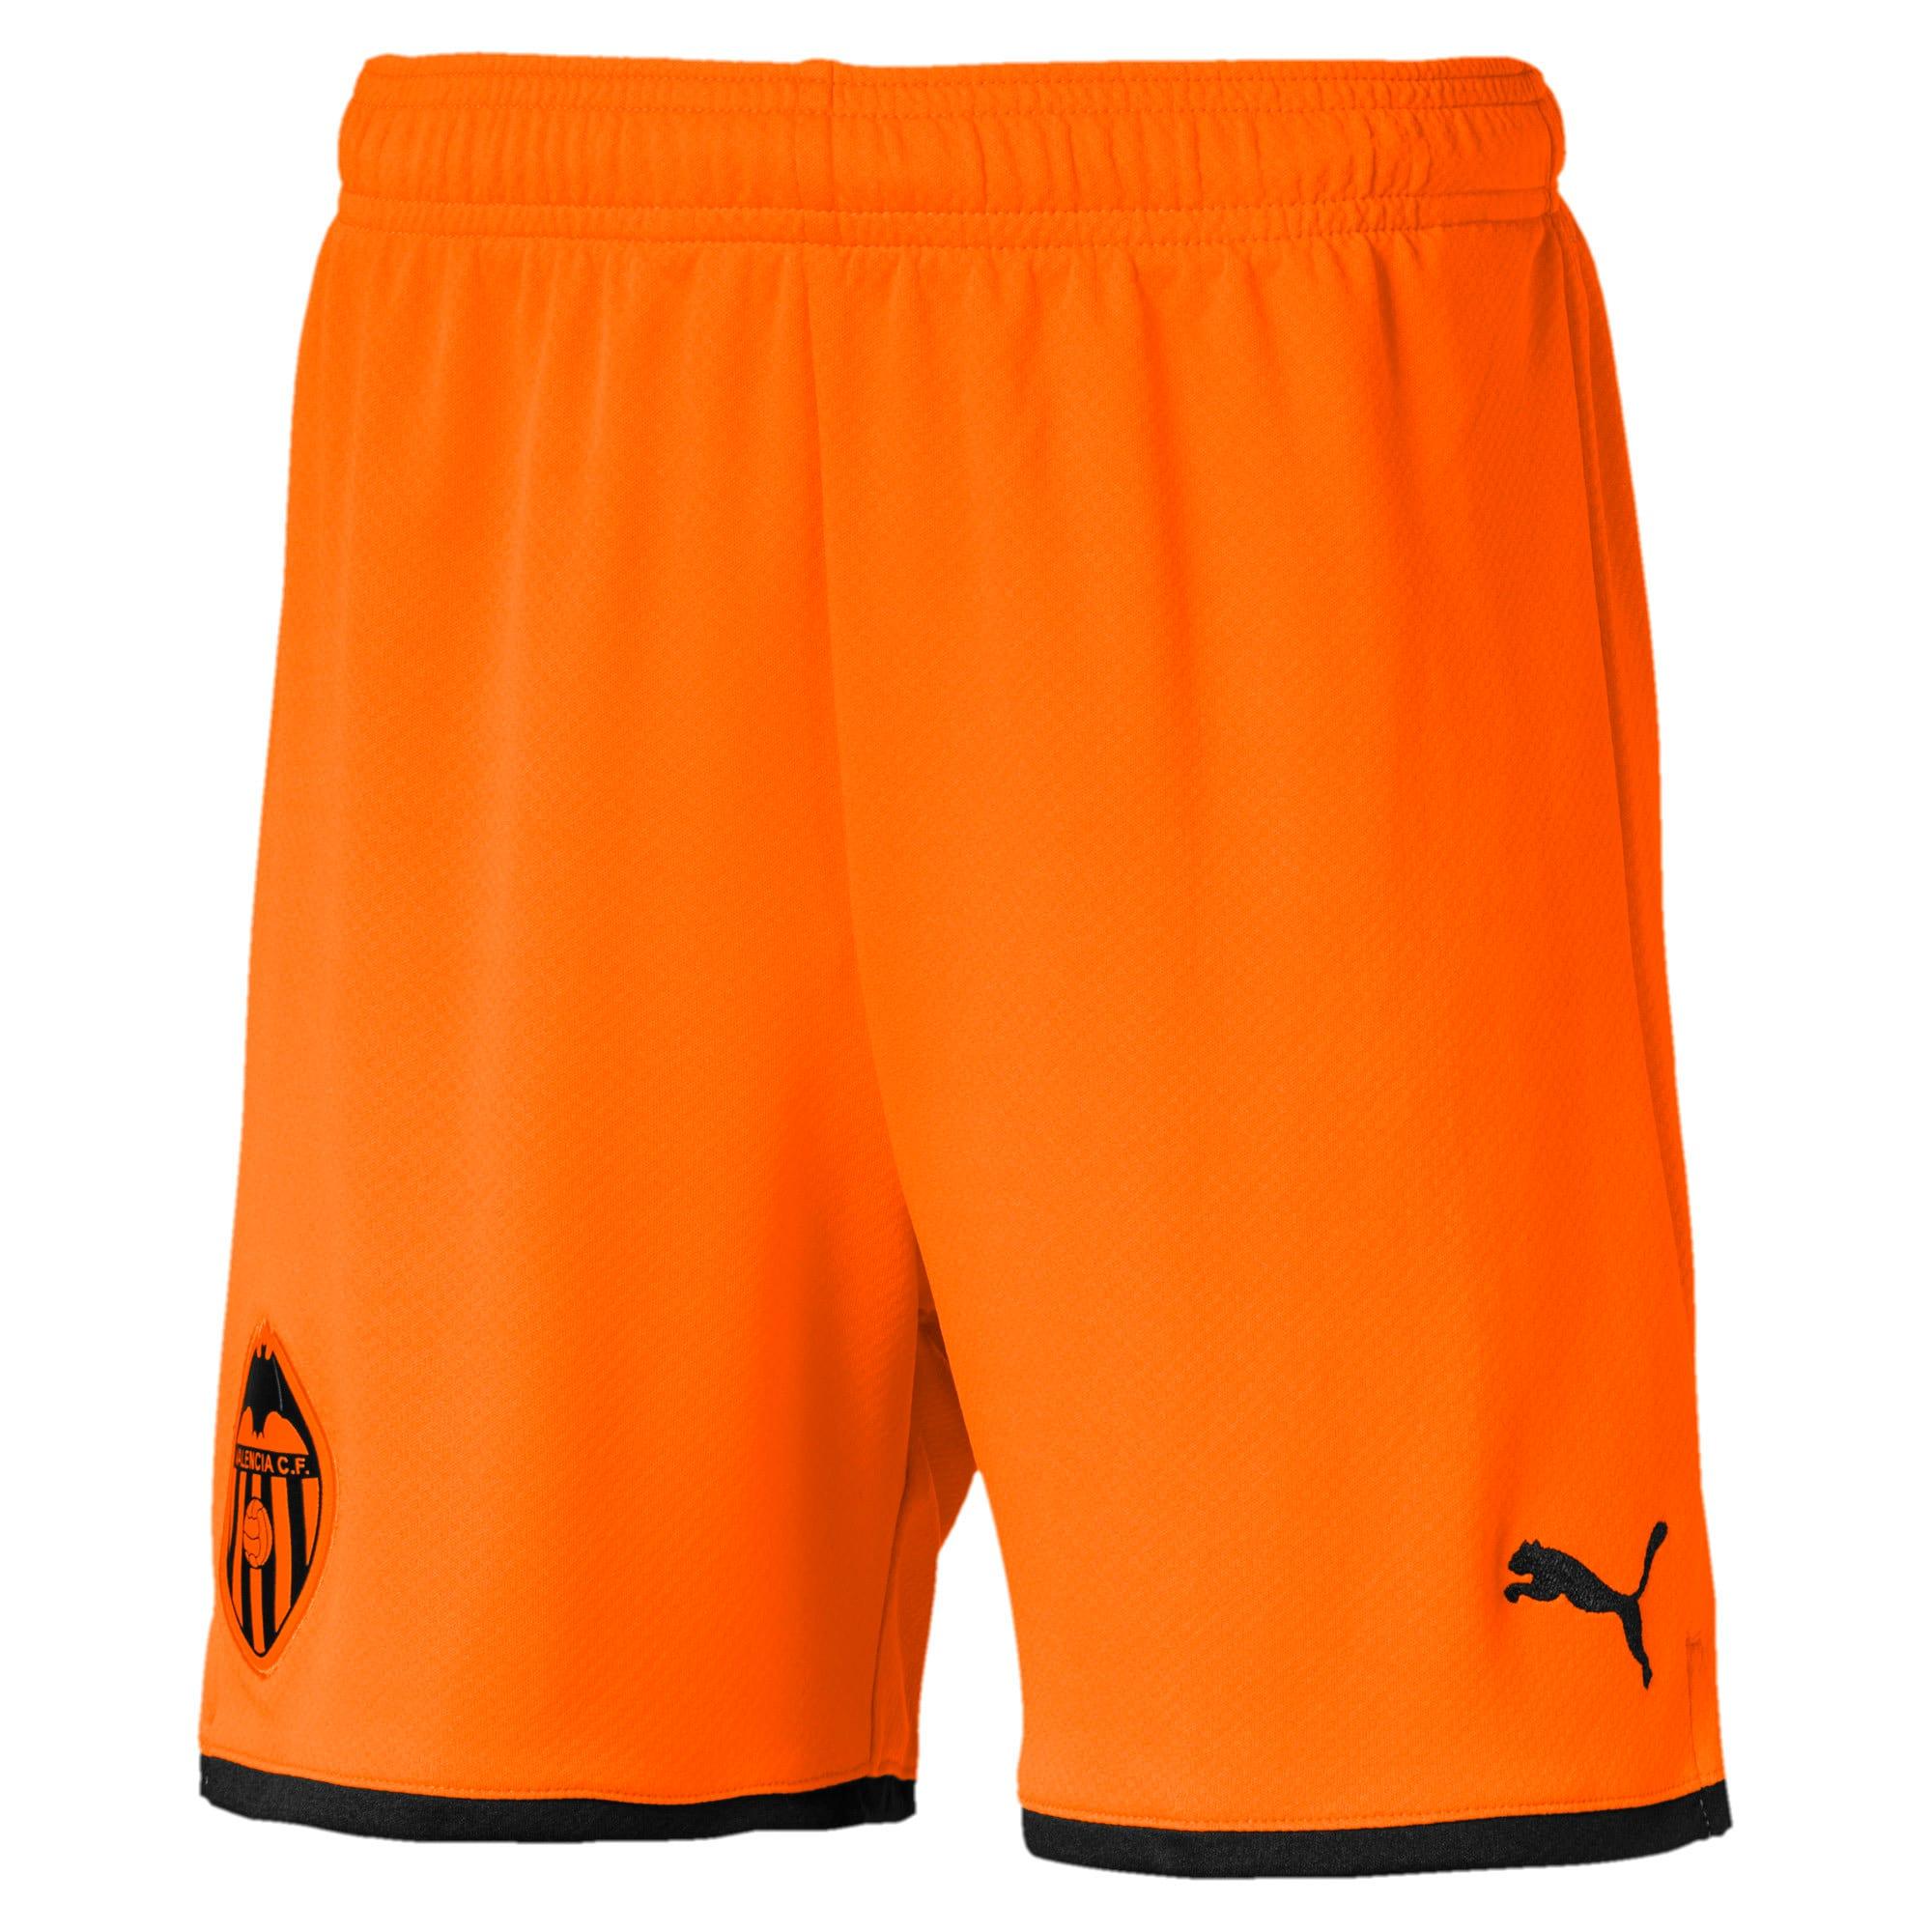 Thumbnail 1 of Valencia CF Boys' Replica Shorts, Vibrant Orange-Puma Black, medium